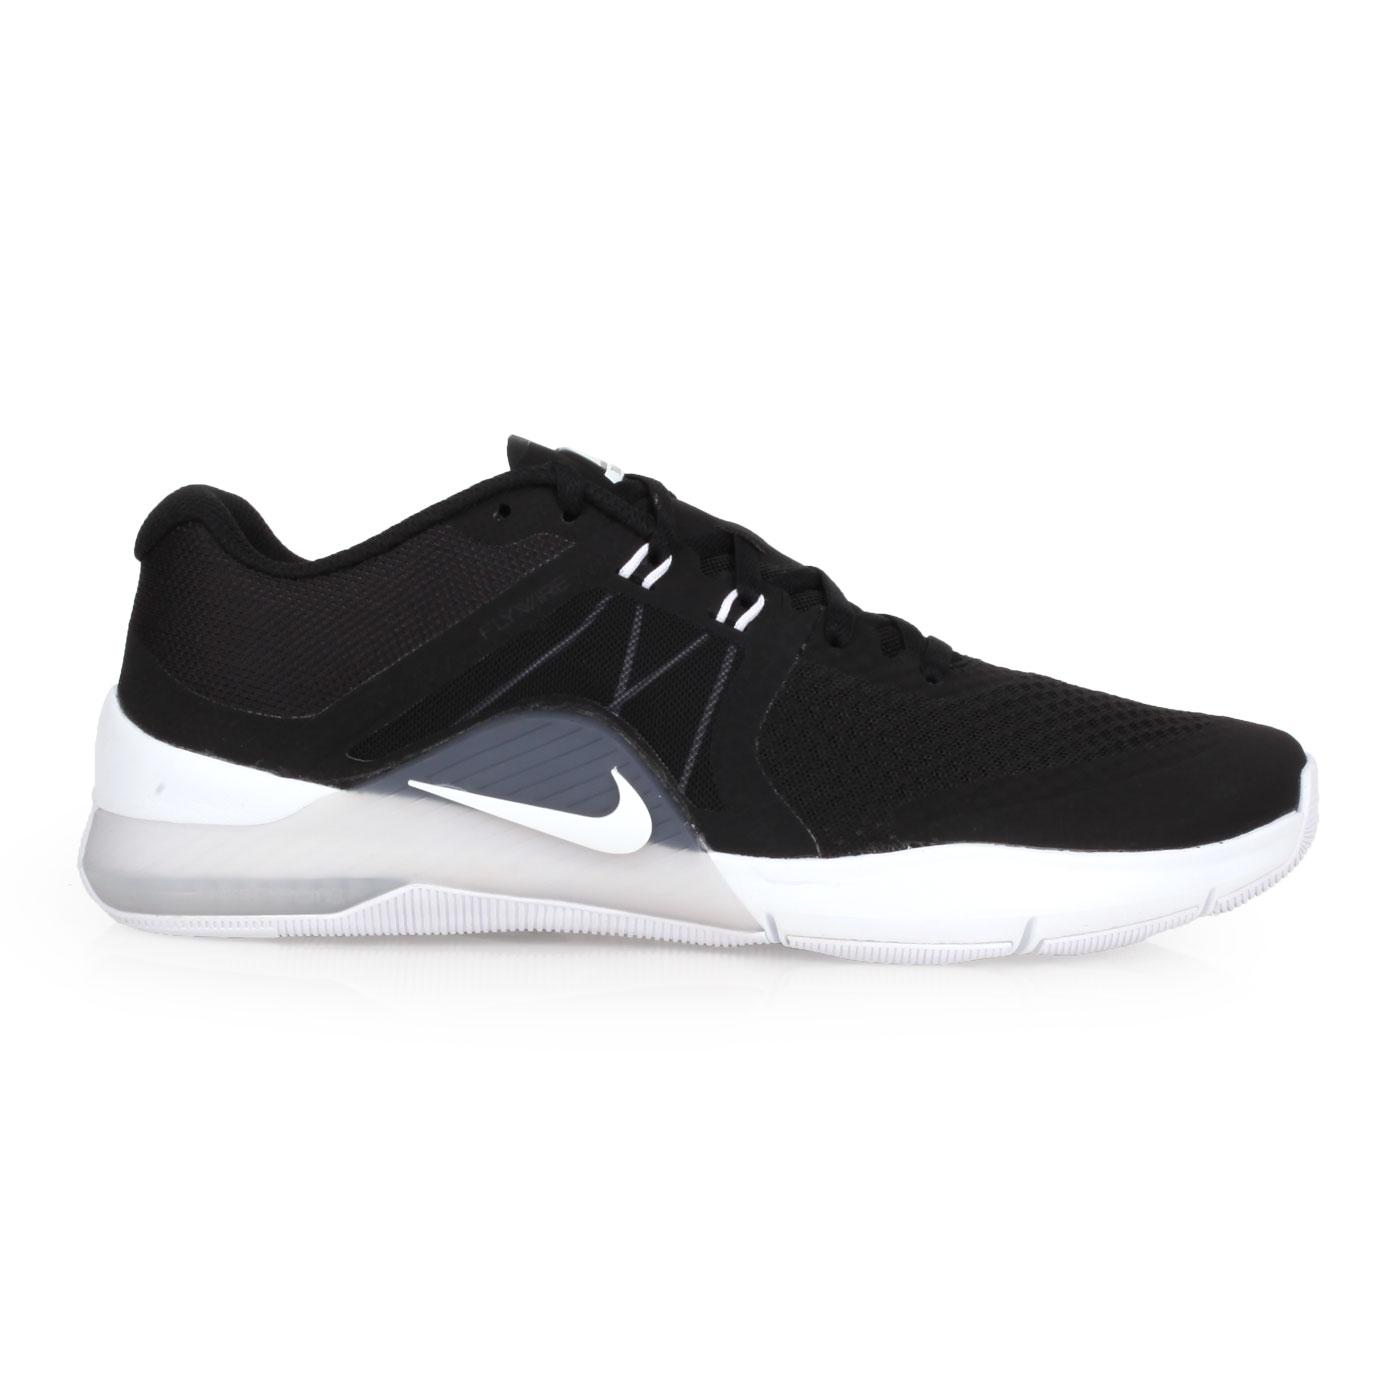 NIKE ZOOM TRAIN COMPLETE 2 男訓練鞋 (免運 慢跑 路跑【02017029】≡排汗專家≡